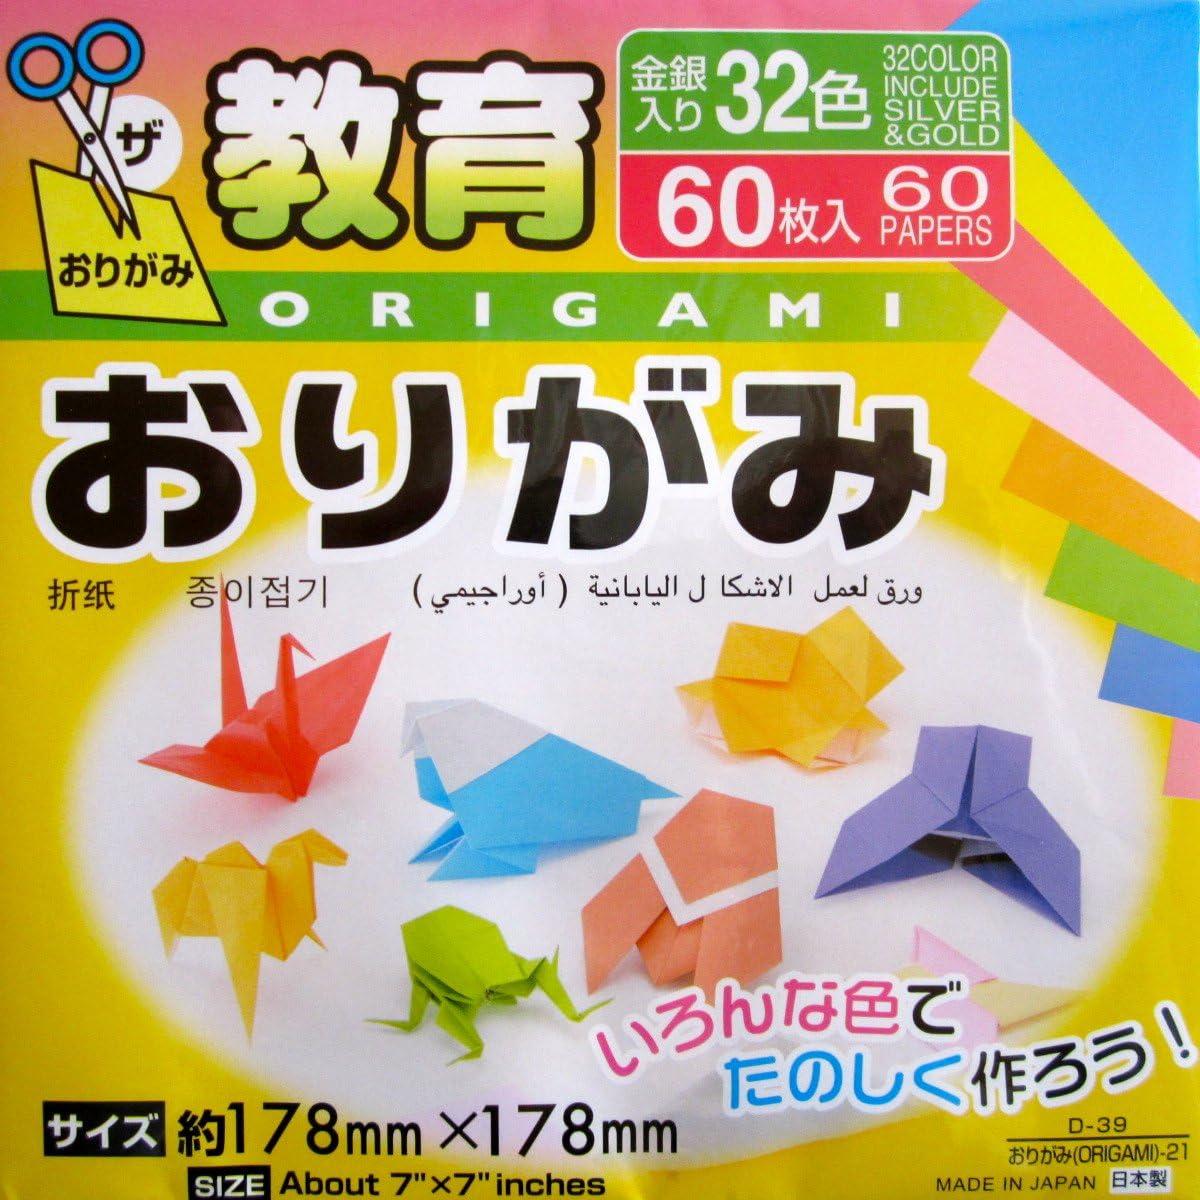 Origami Paper Size Calculator - Make Origami Models a Specific Size | 1200x1200